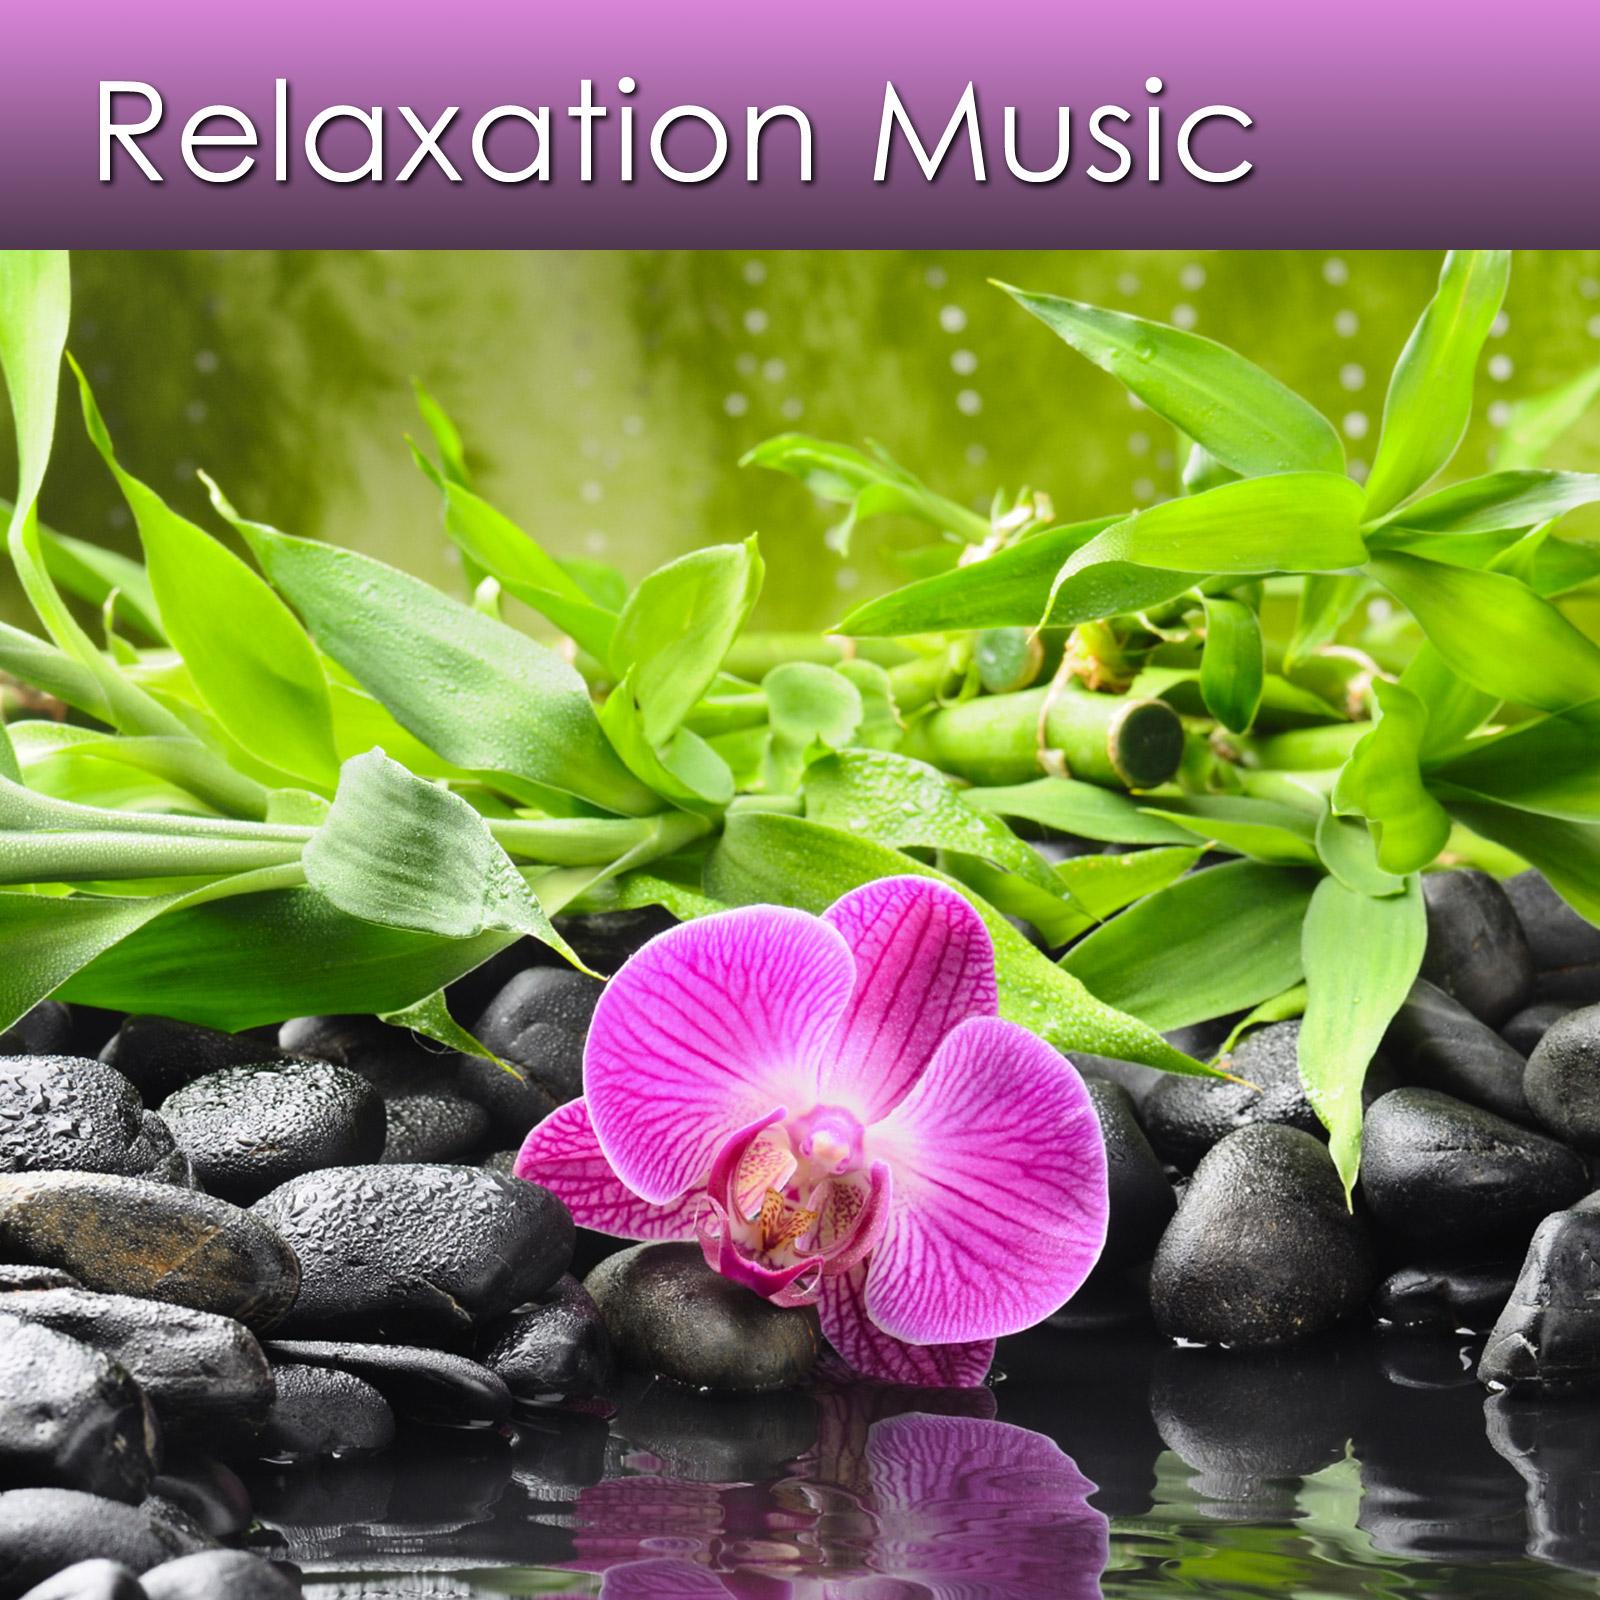 Relaxation-Music1600x1600-3.jpg